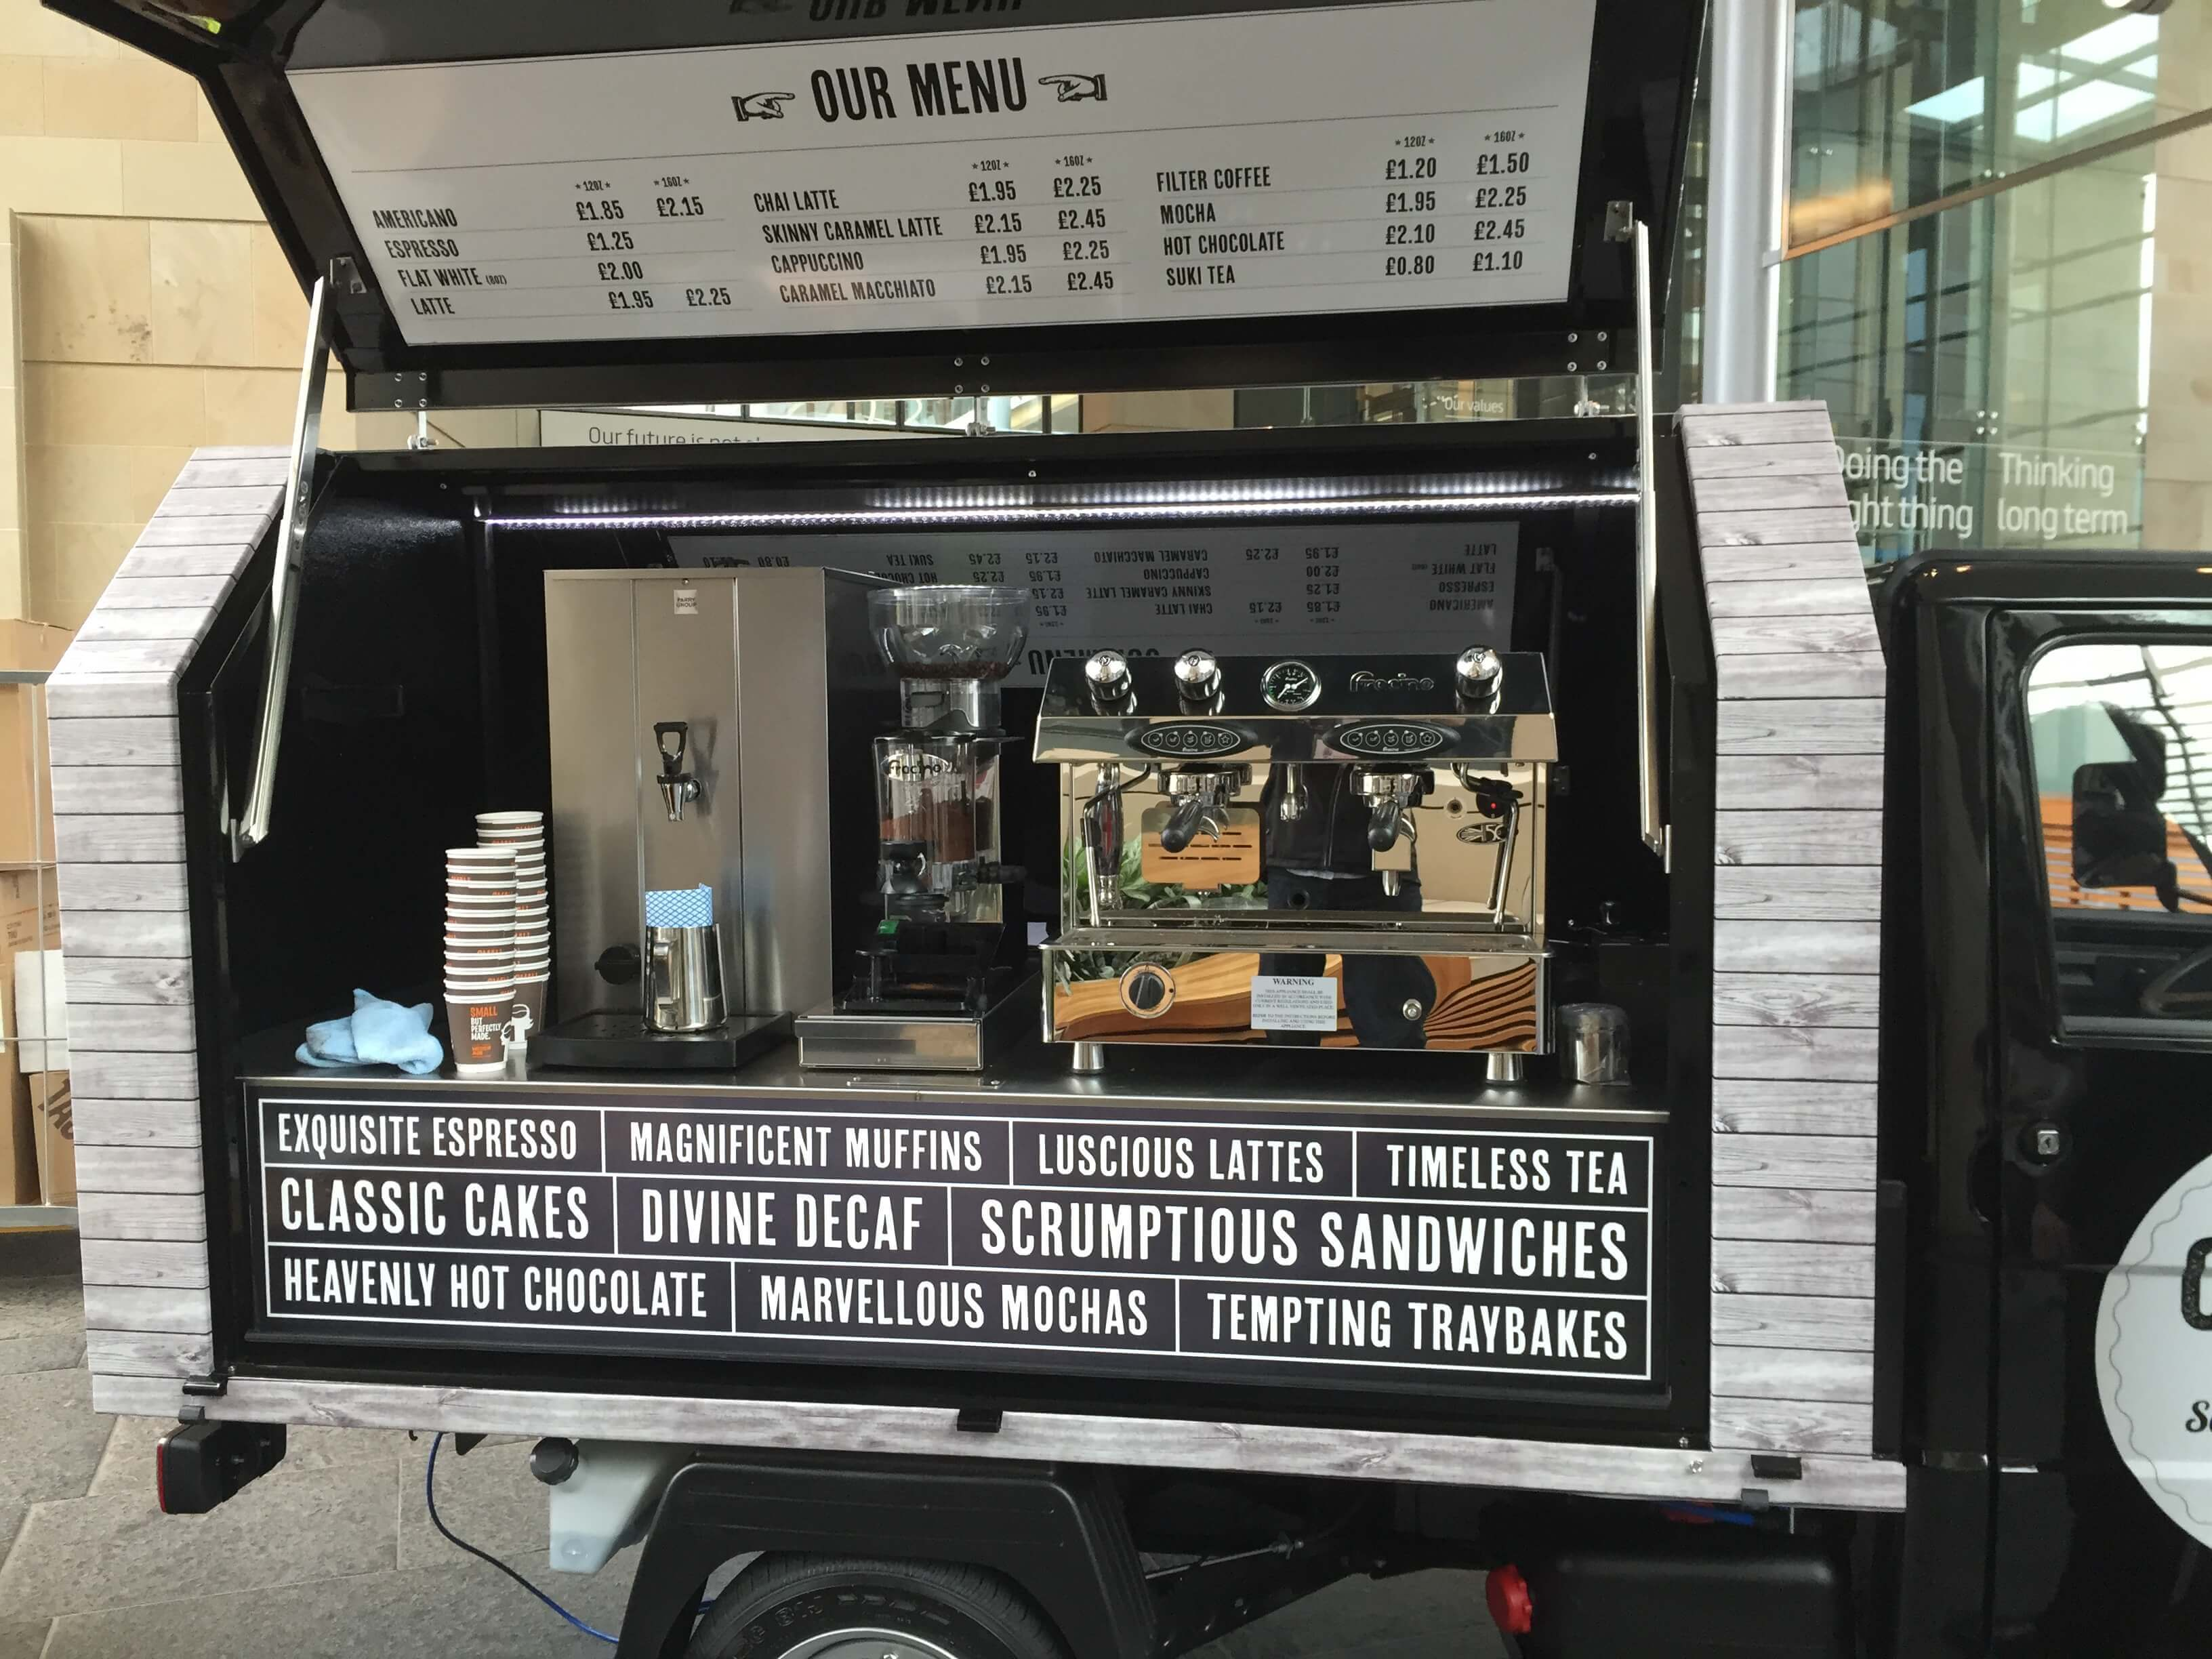 Mobile Coffee Van - Piaggio Ape Gull Wing